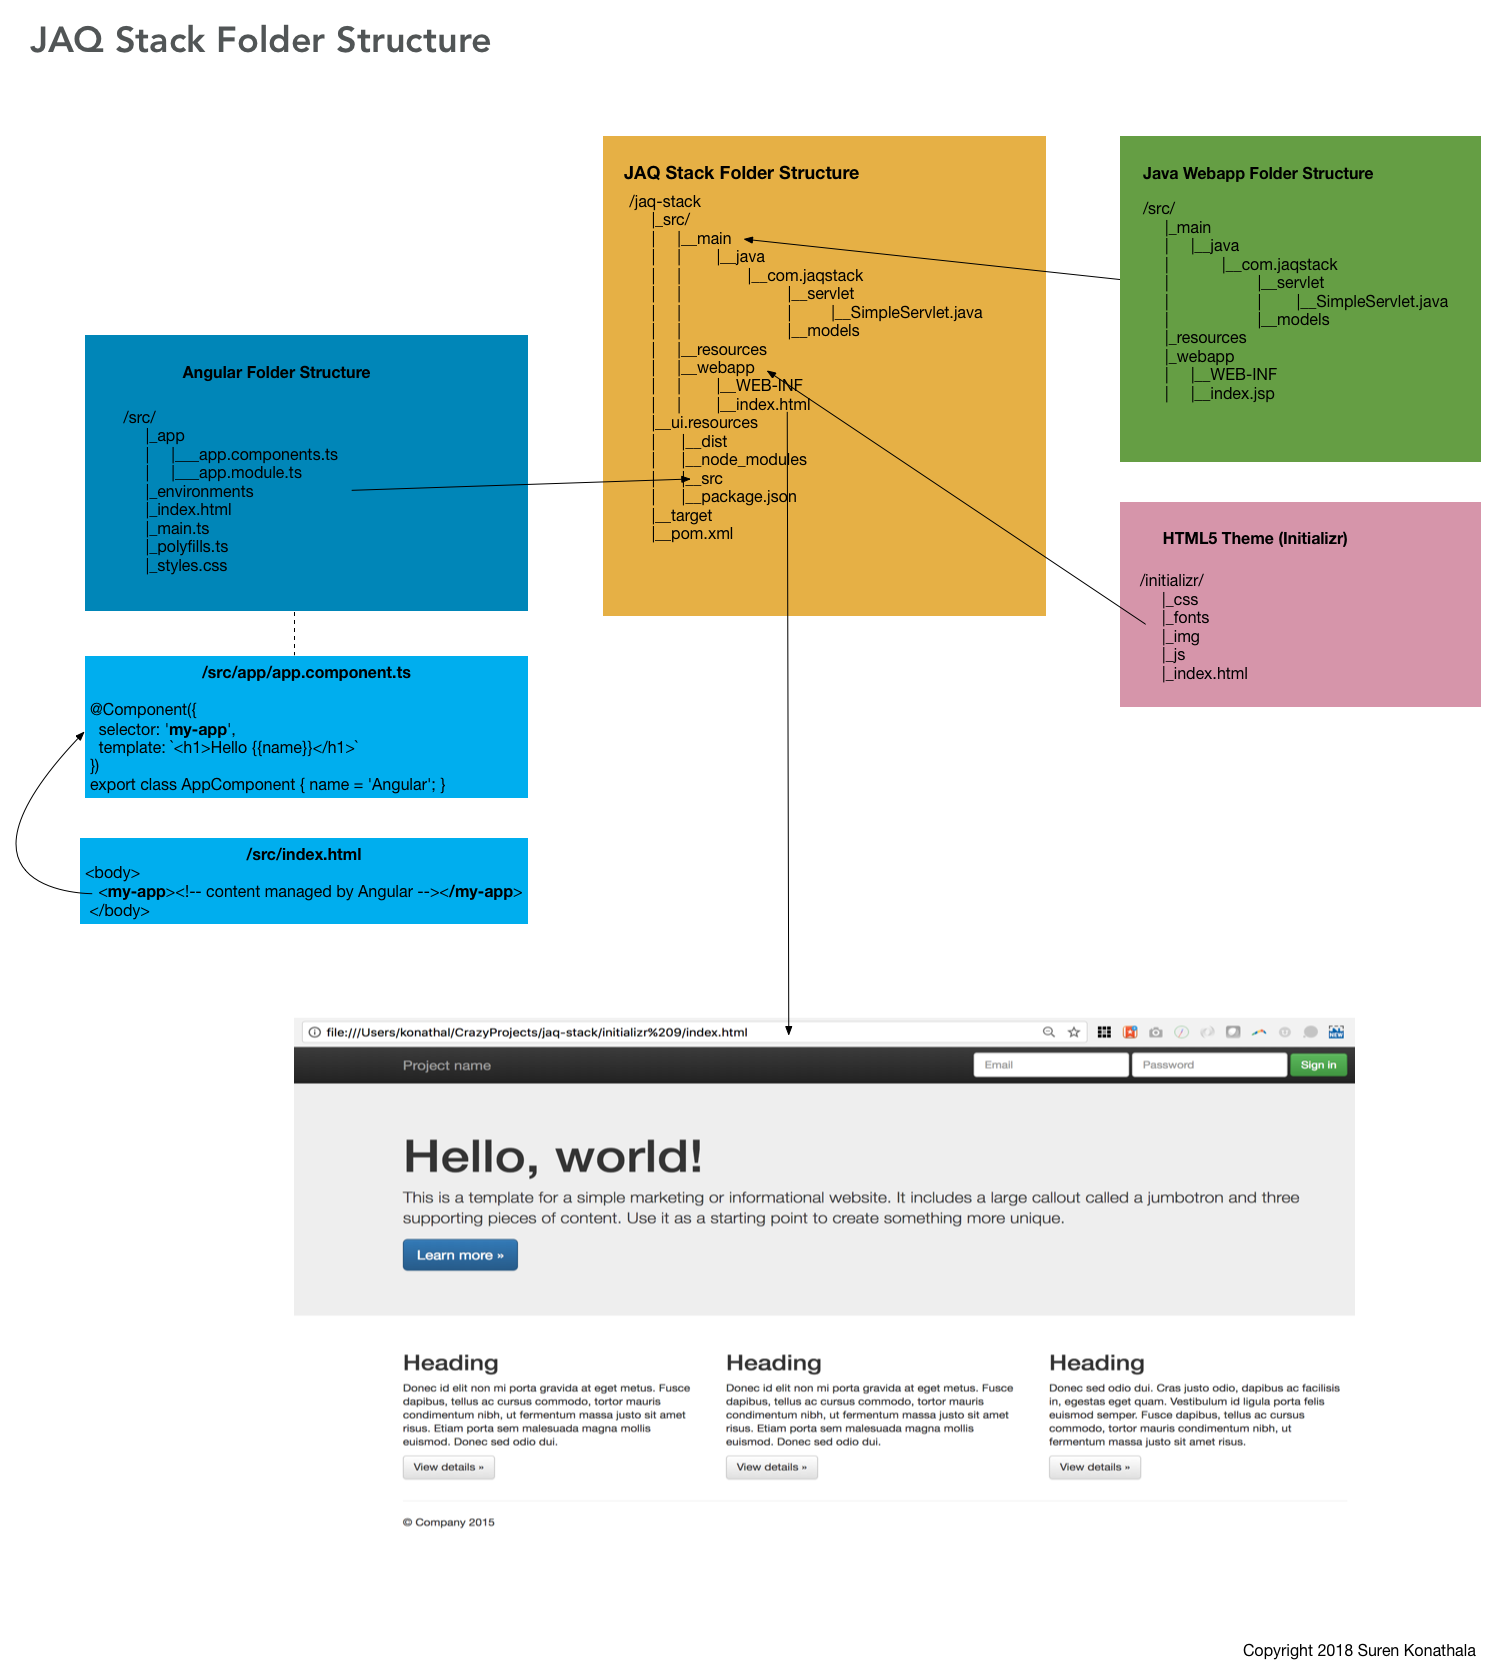 jaq-stack-folder-structure